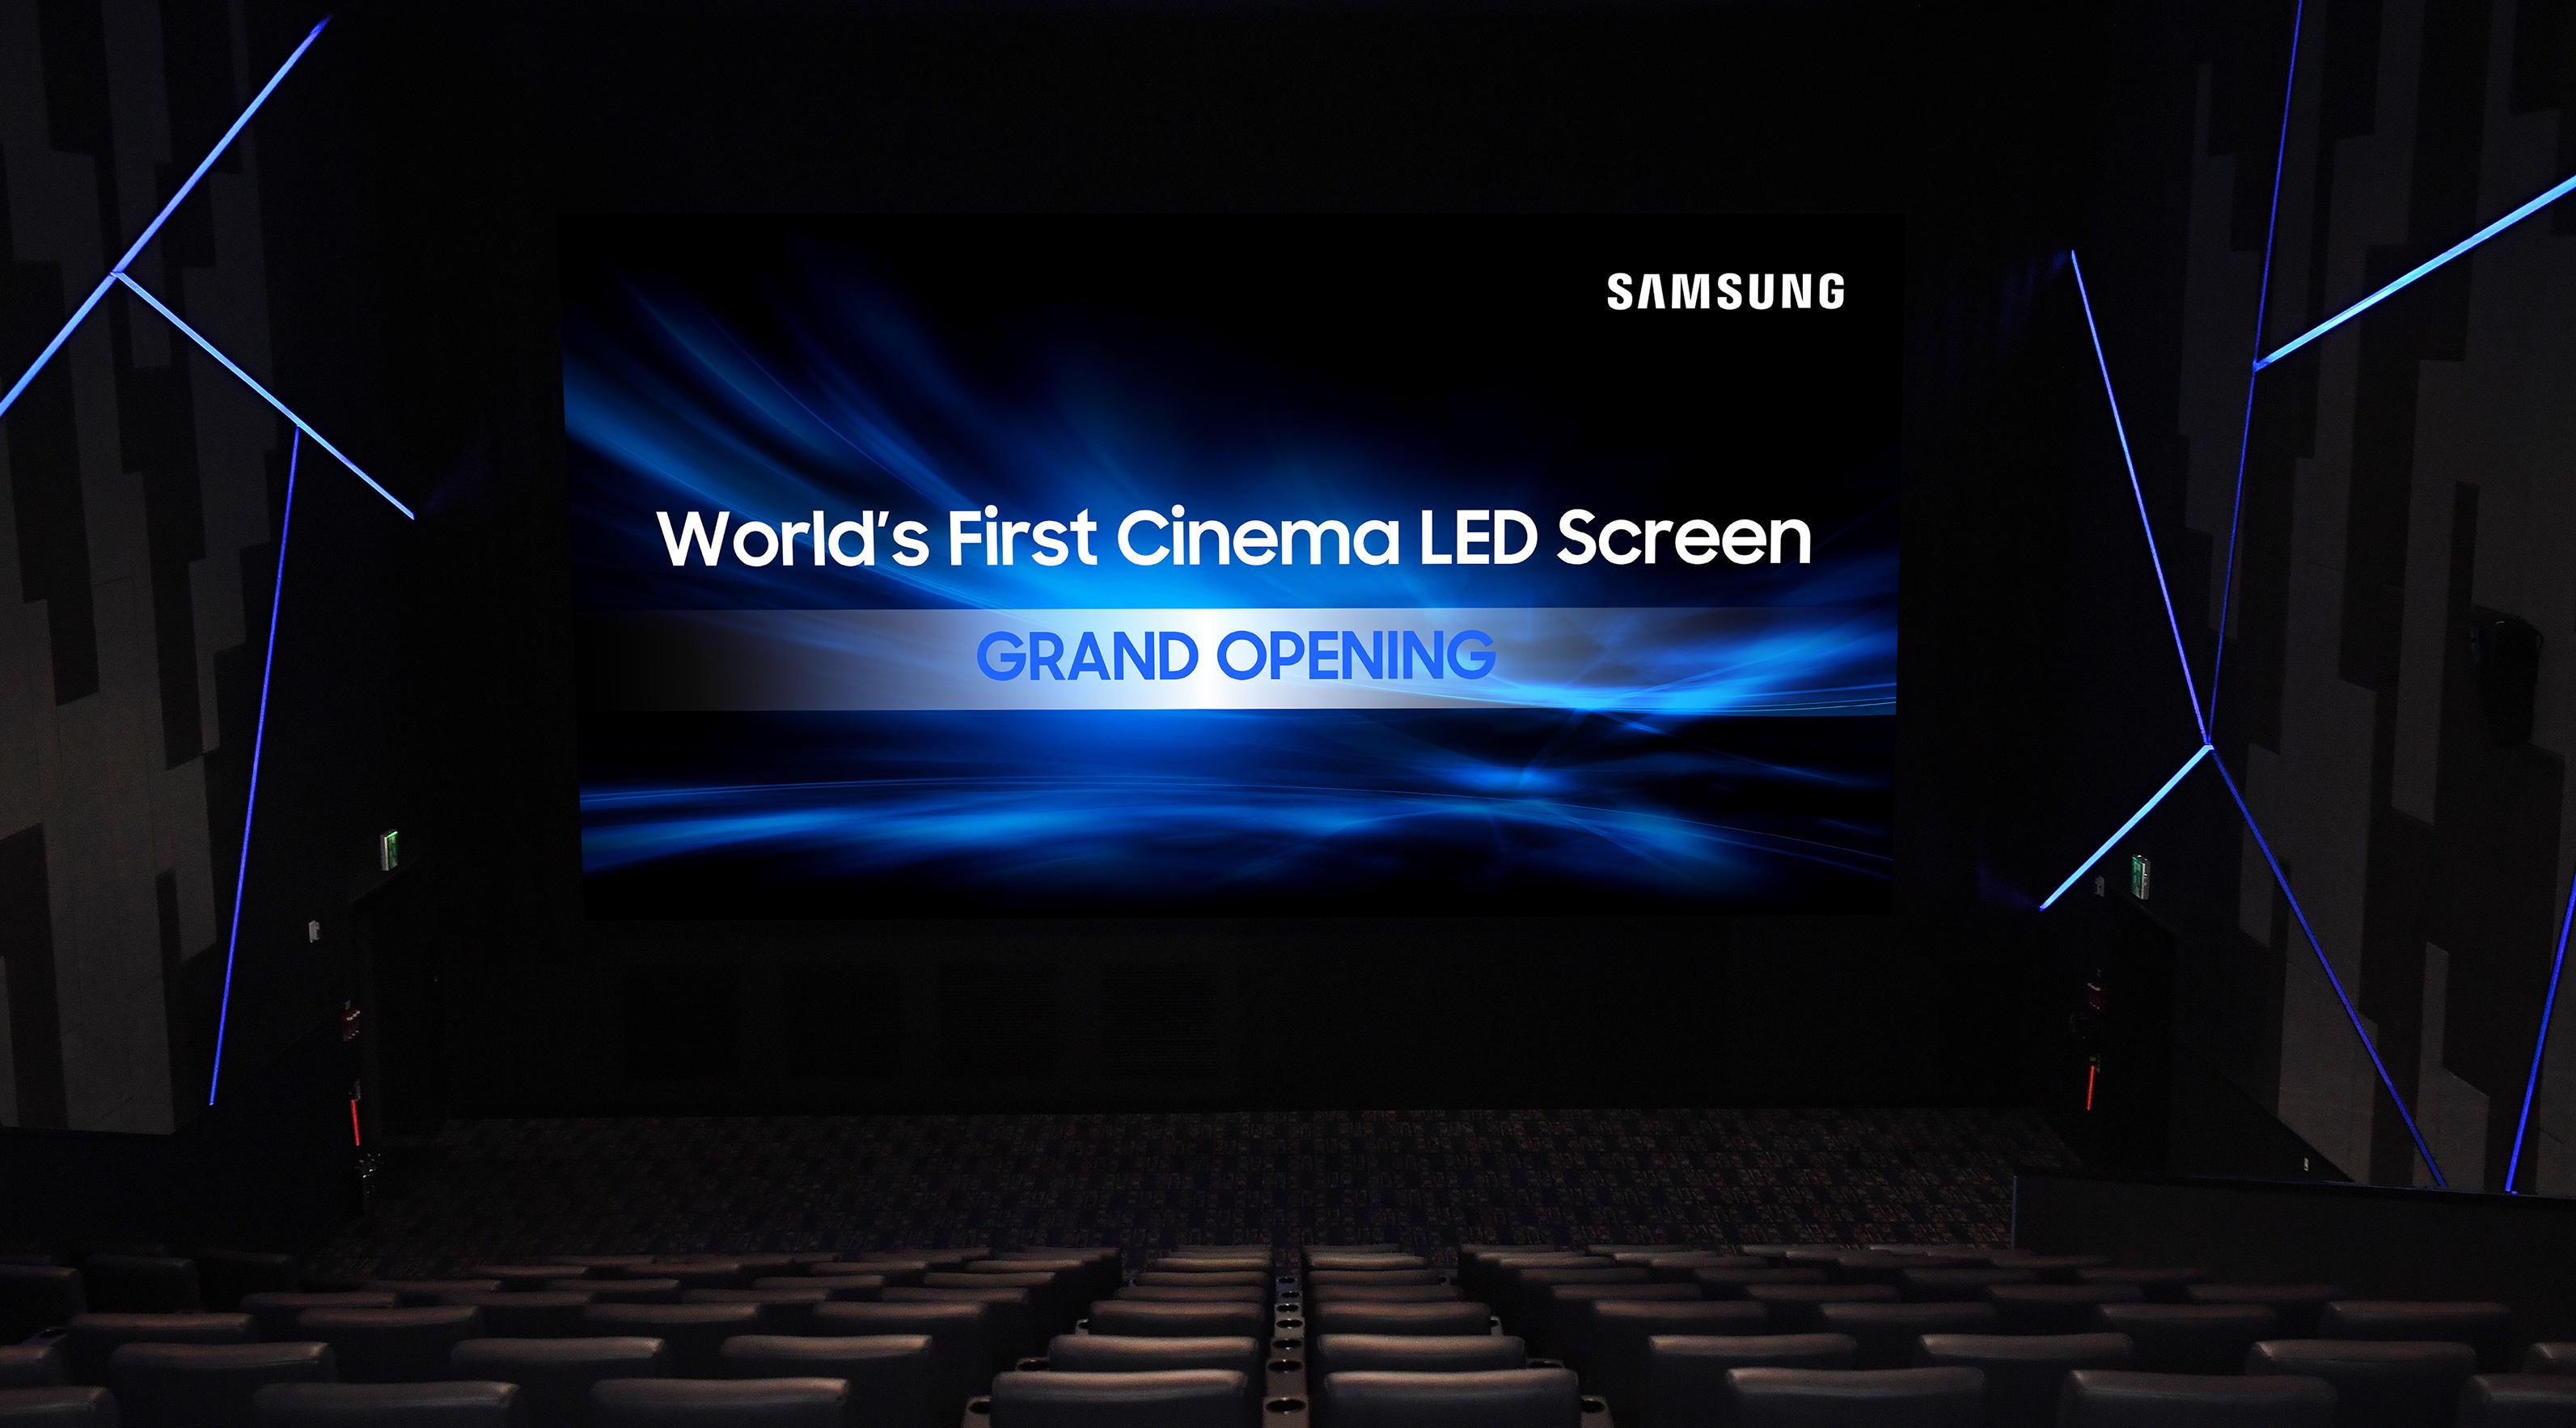 Samsung S Fancy 4k Cinema Led Display Tech Is Going On A Euro Trip  -> Fotos De Cinemas